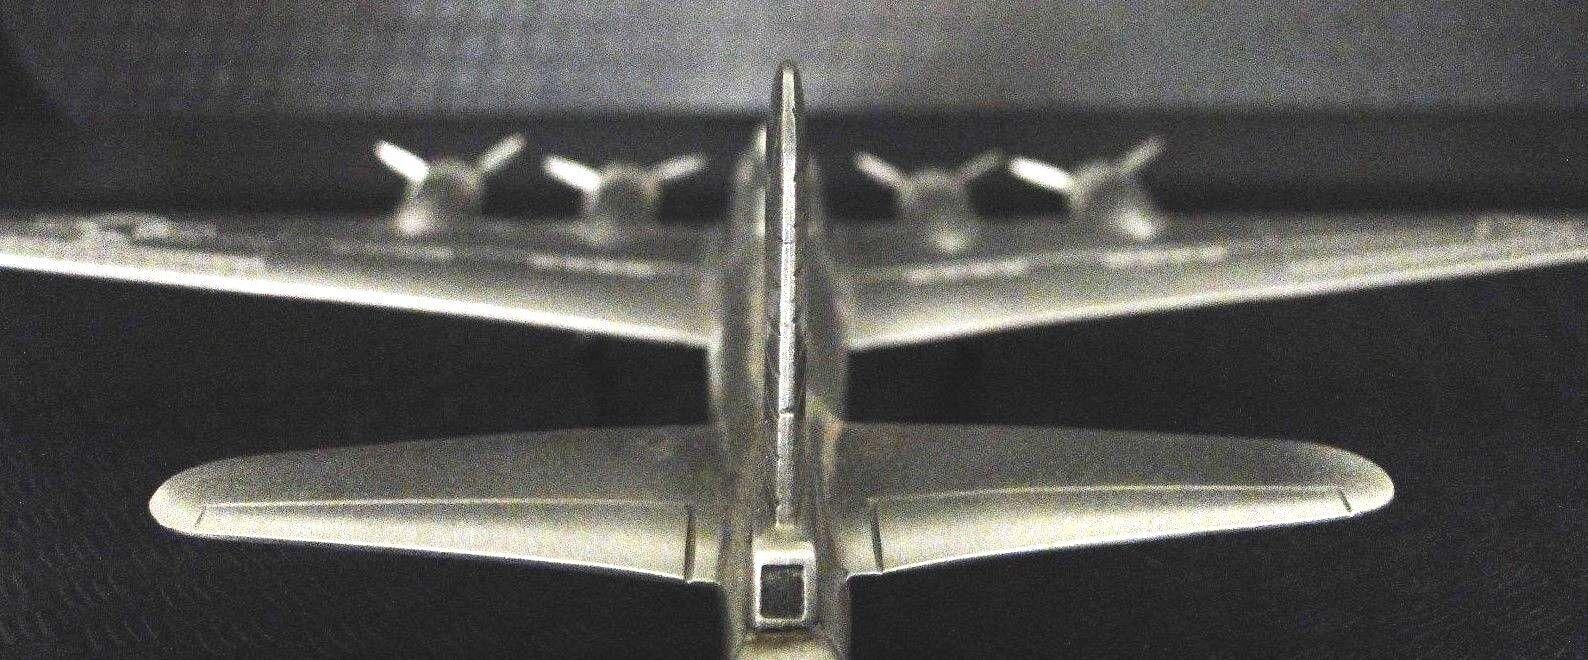 WW2 B17 B17 B17 Bomber 1 Military Aircraft Airplane Air Plane Craft Metal Army U.S. B 48 4f1cea